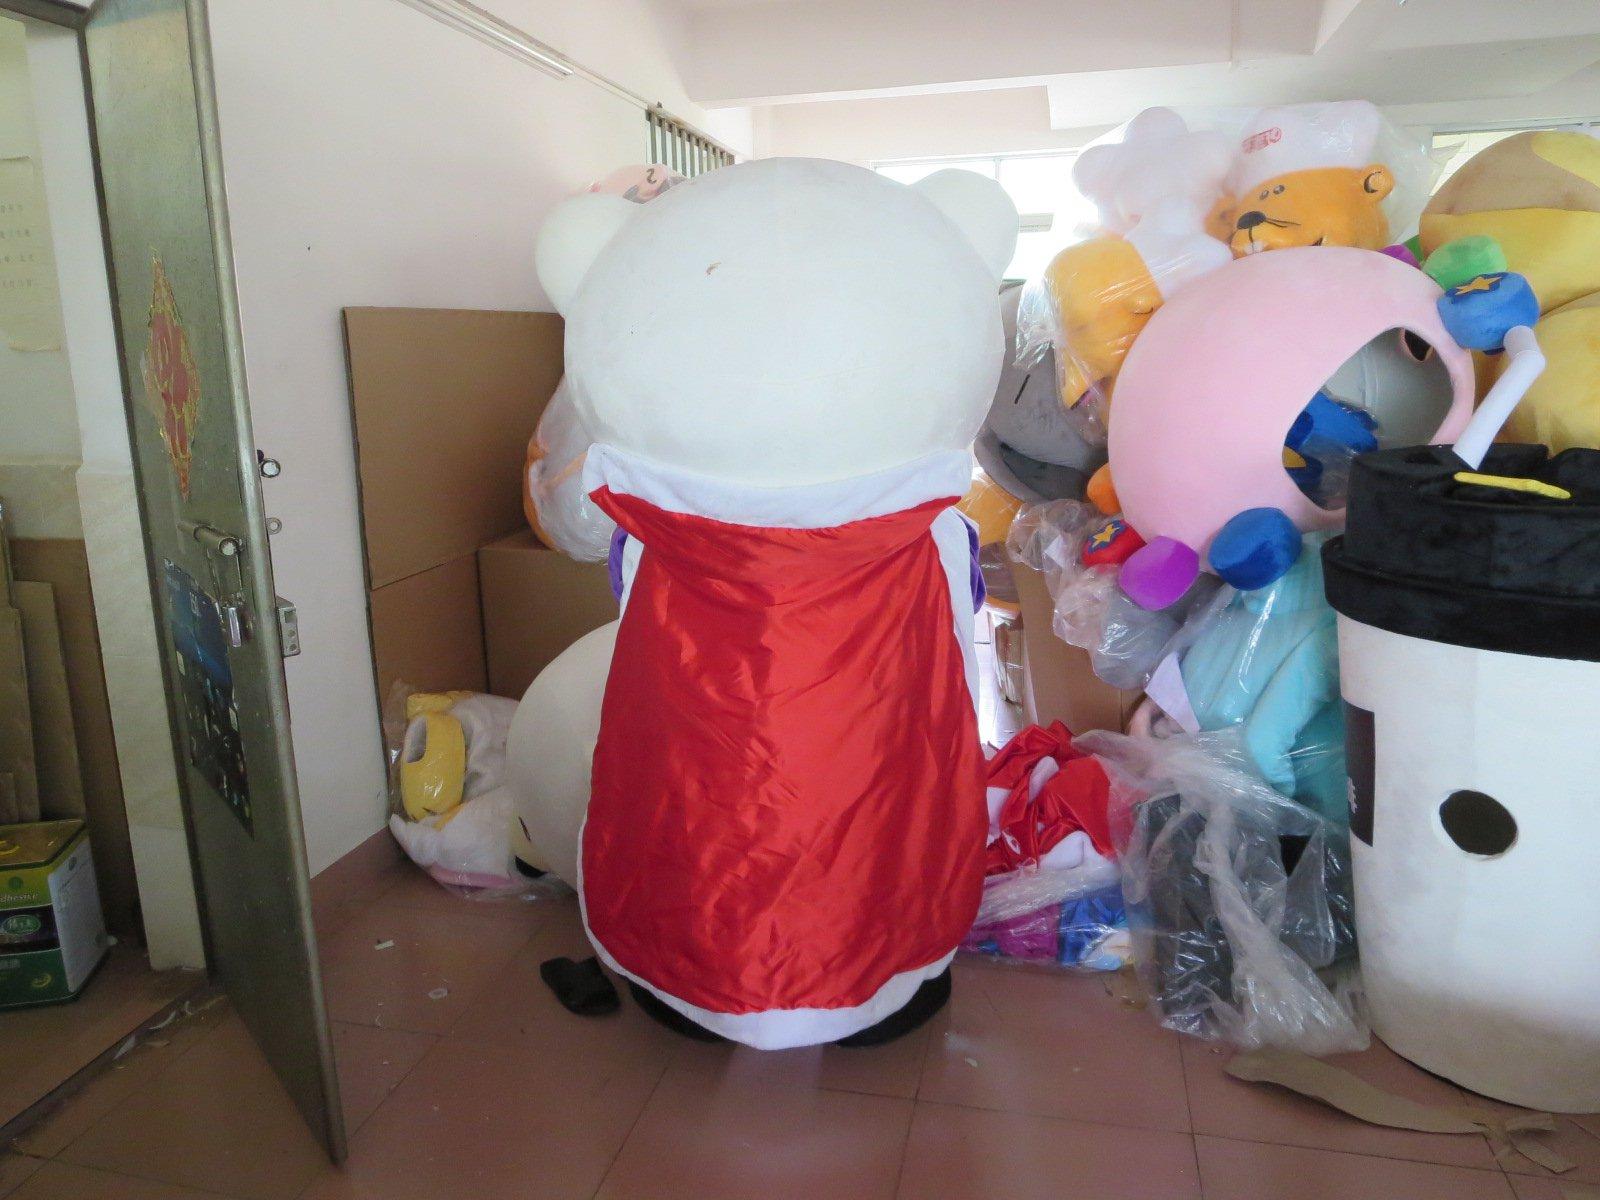 Couple Bear Doll Dress Costumes and Candy White Female Bear Snowman Cartoon Dolls Summer Dress Mascot Costume